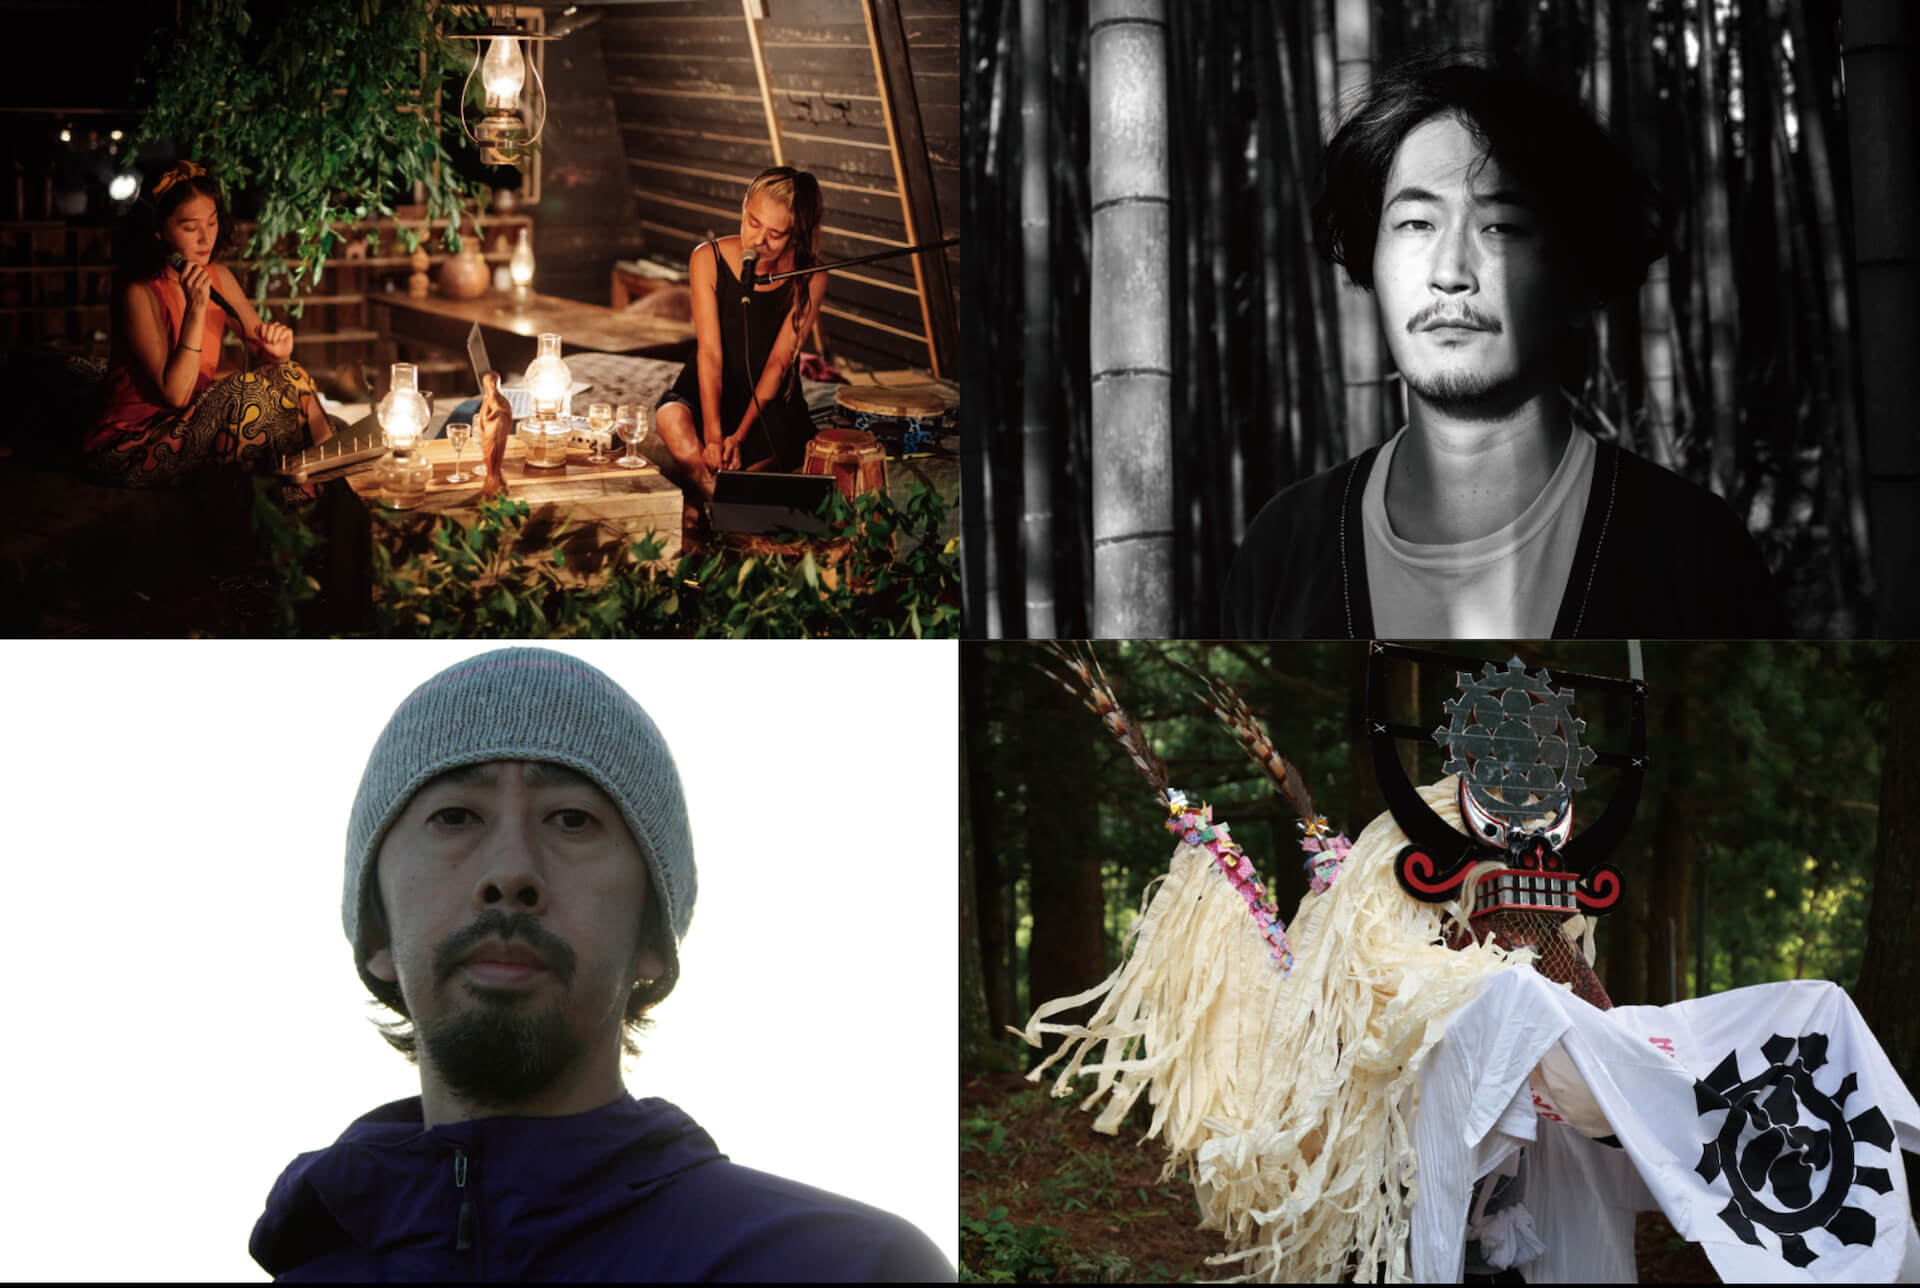 OLAibi+KOM_I、Kuniyuki Takashiらが出演するカルチャーツアー<遠野メグリトロゲ>が開催決定! culture210701_touno2